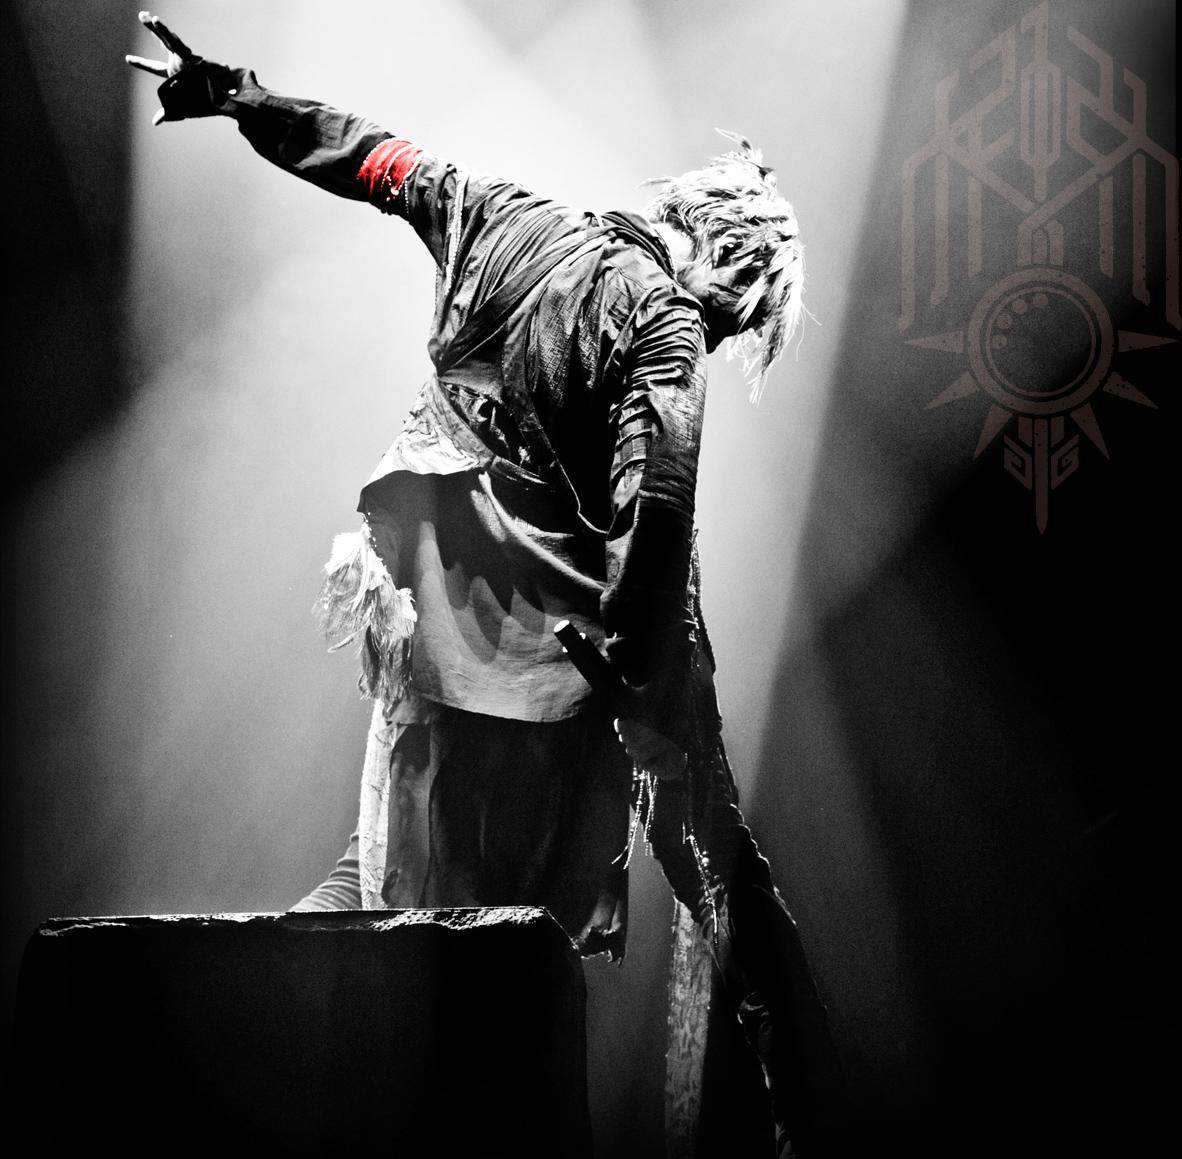 Acid Black Cherry Yasu 画像まとめ 壁紙 ライブ画 Naver まとめ